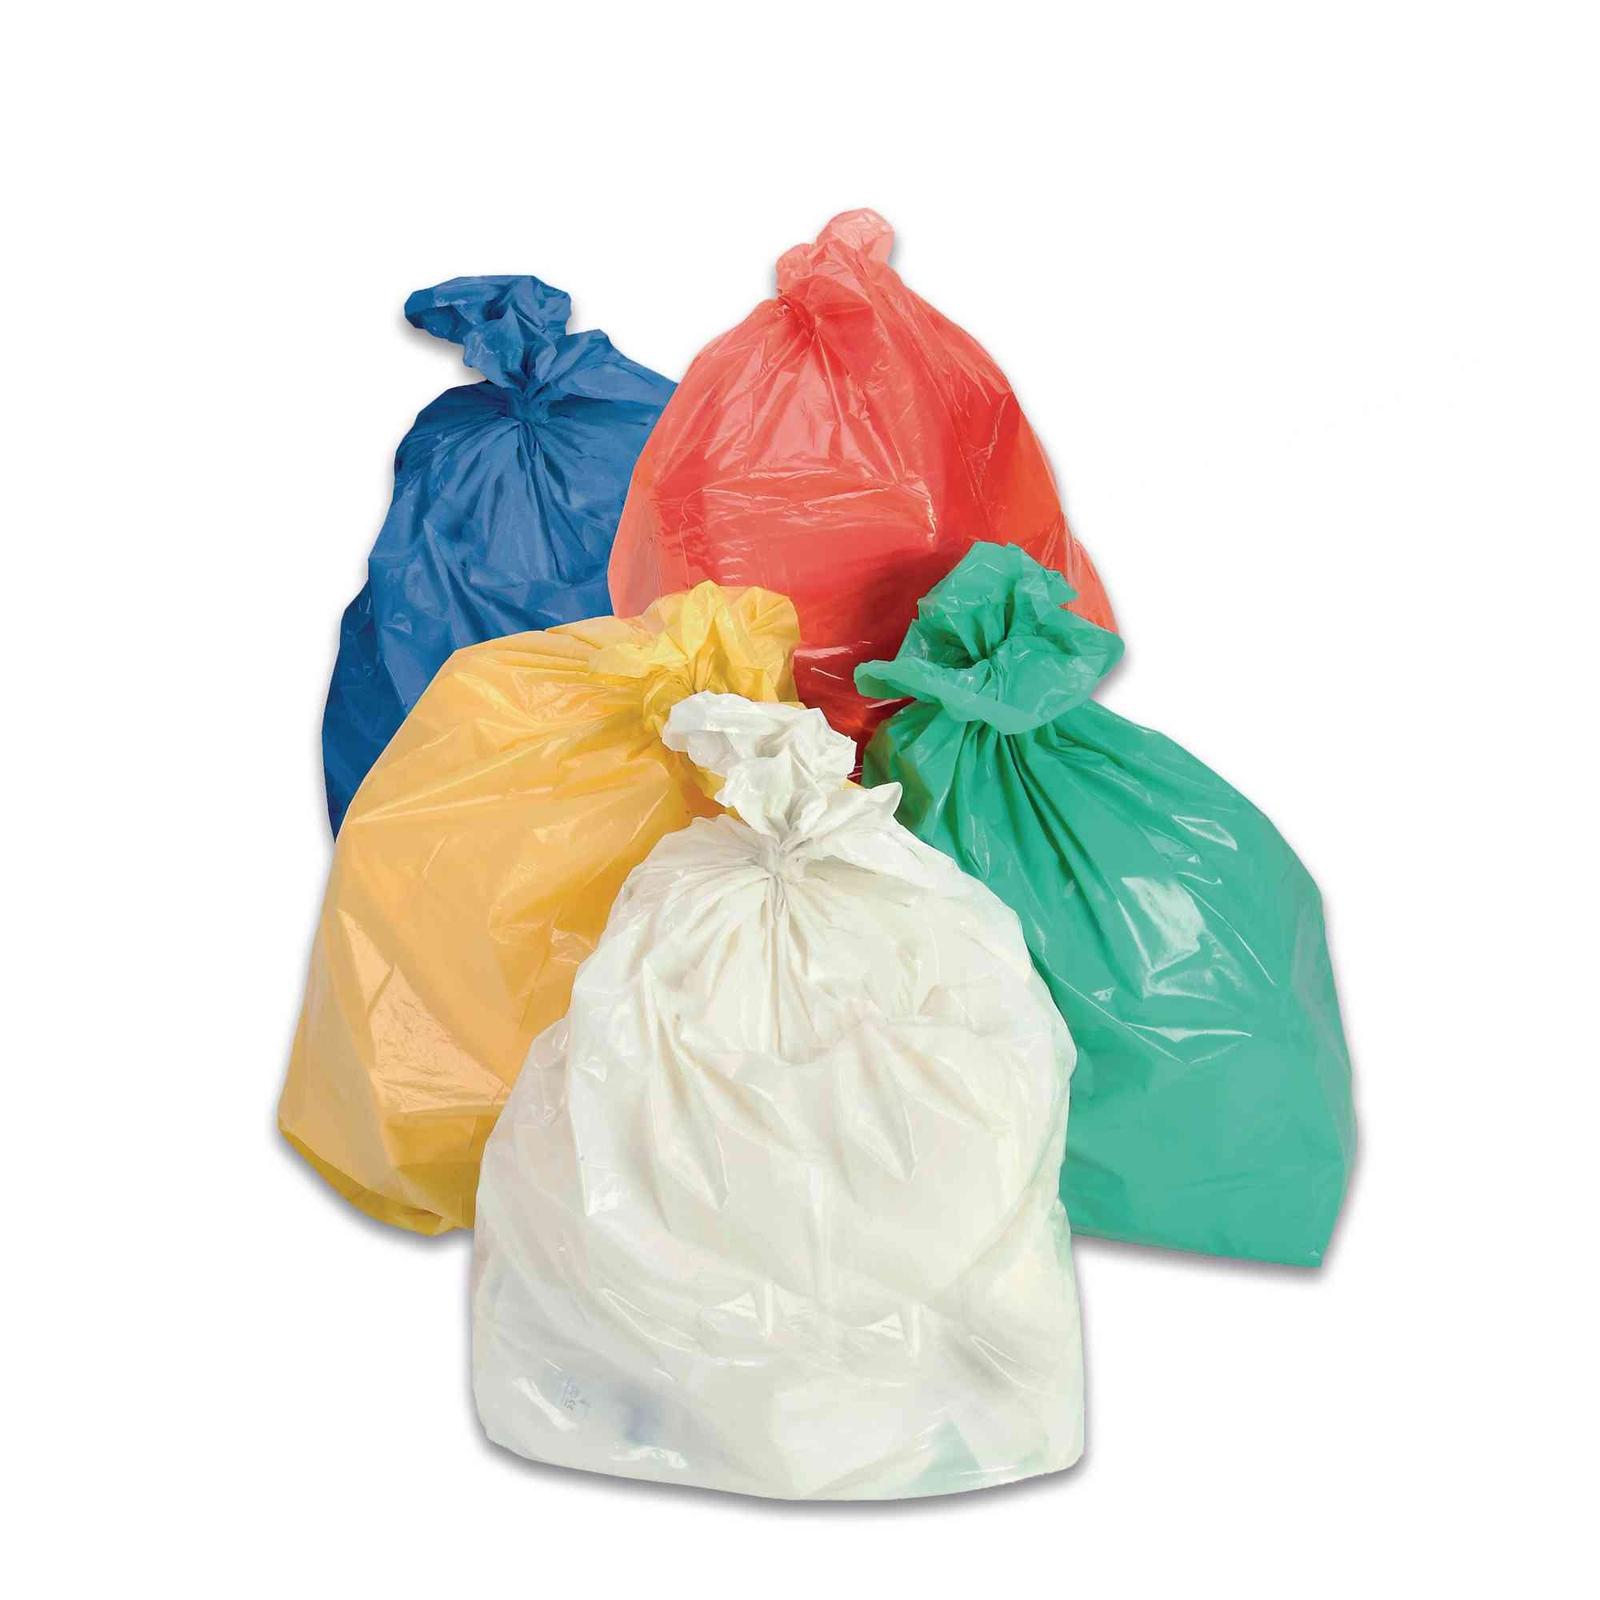 Coloured Refuse Sacks - White